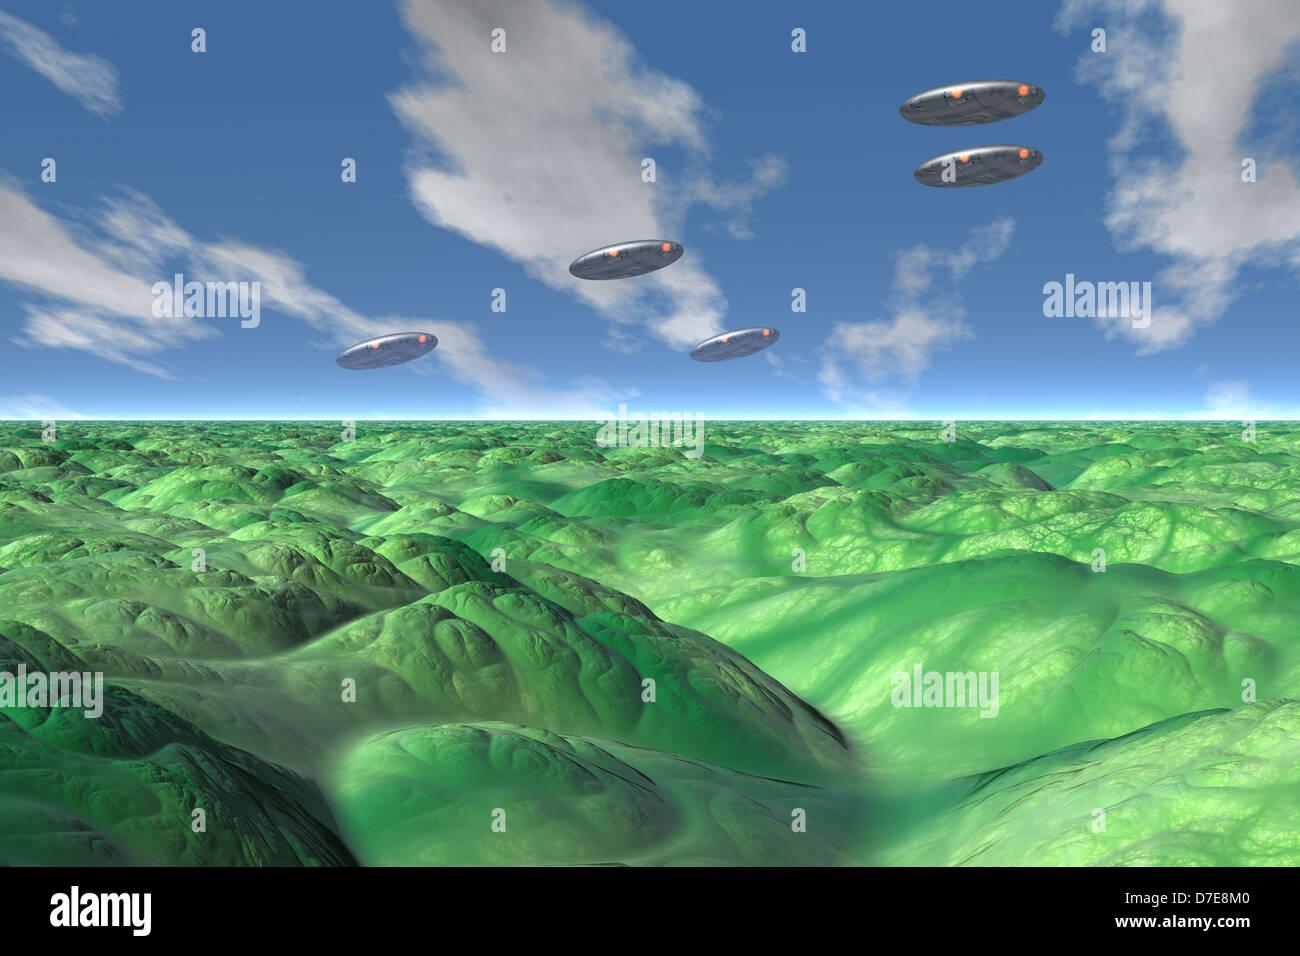 Alien world computer illustration - Stock Image